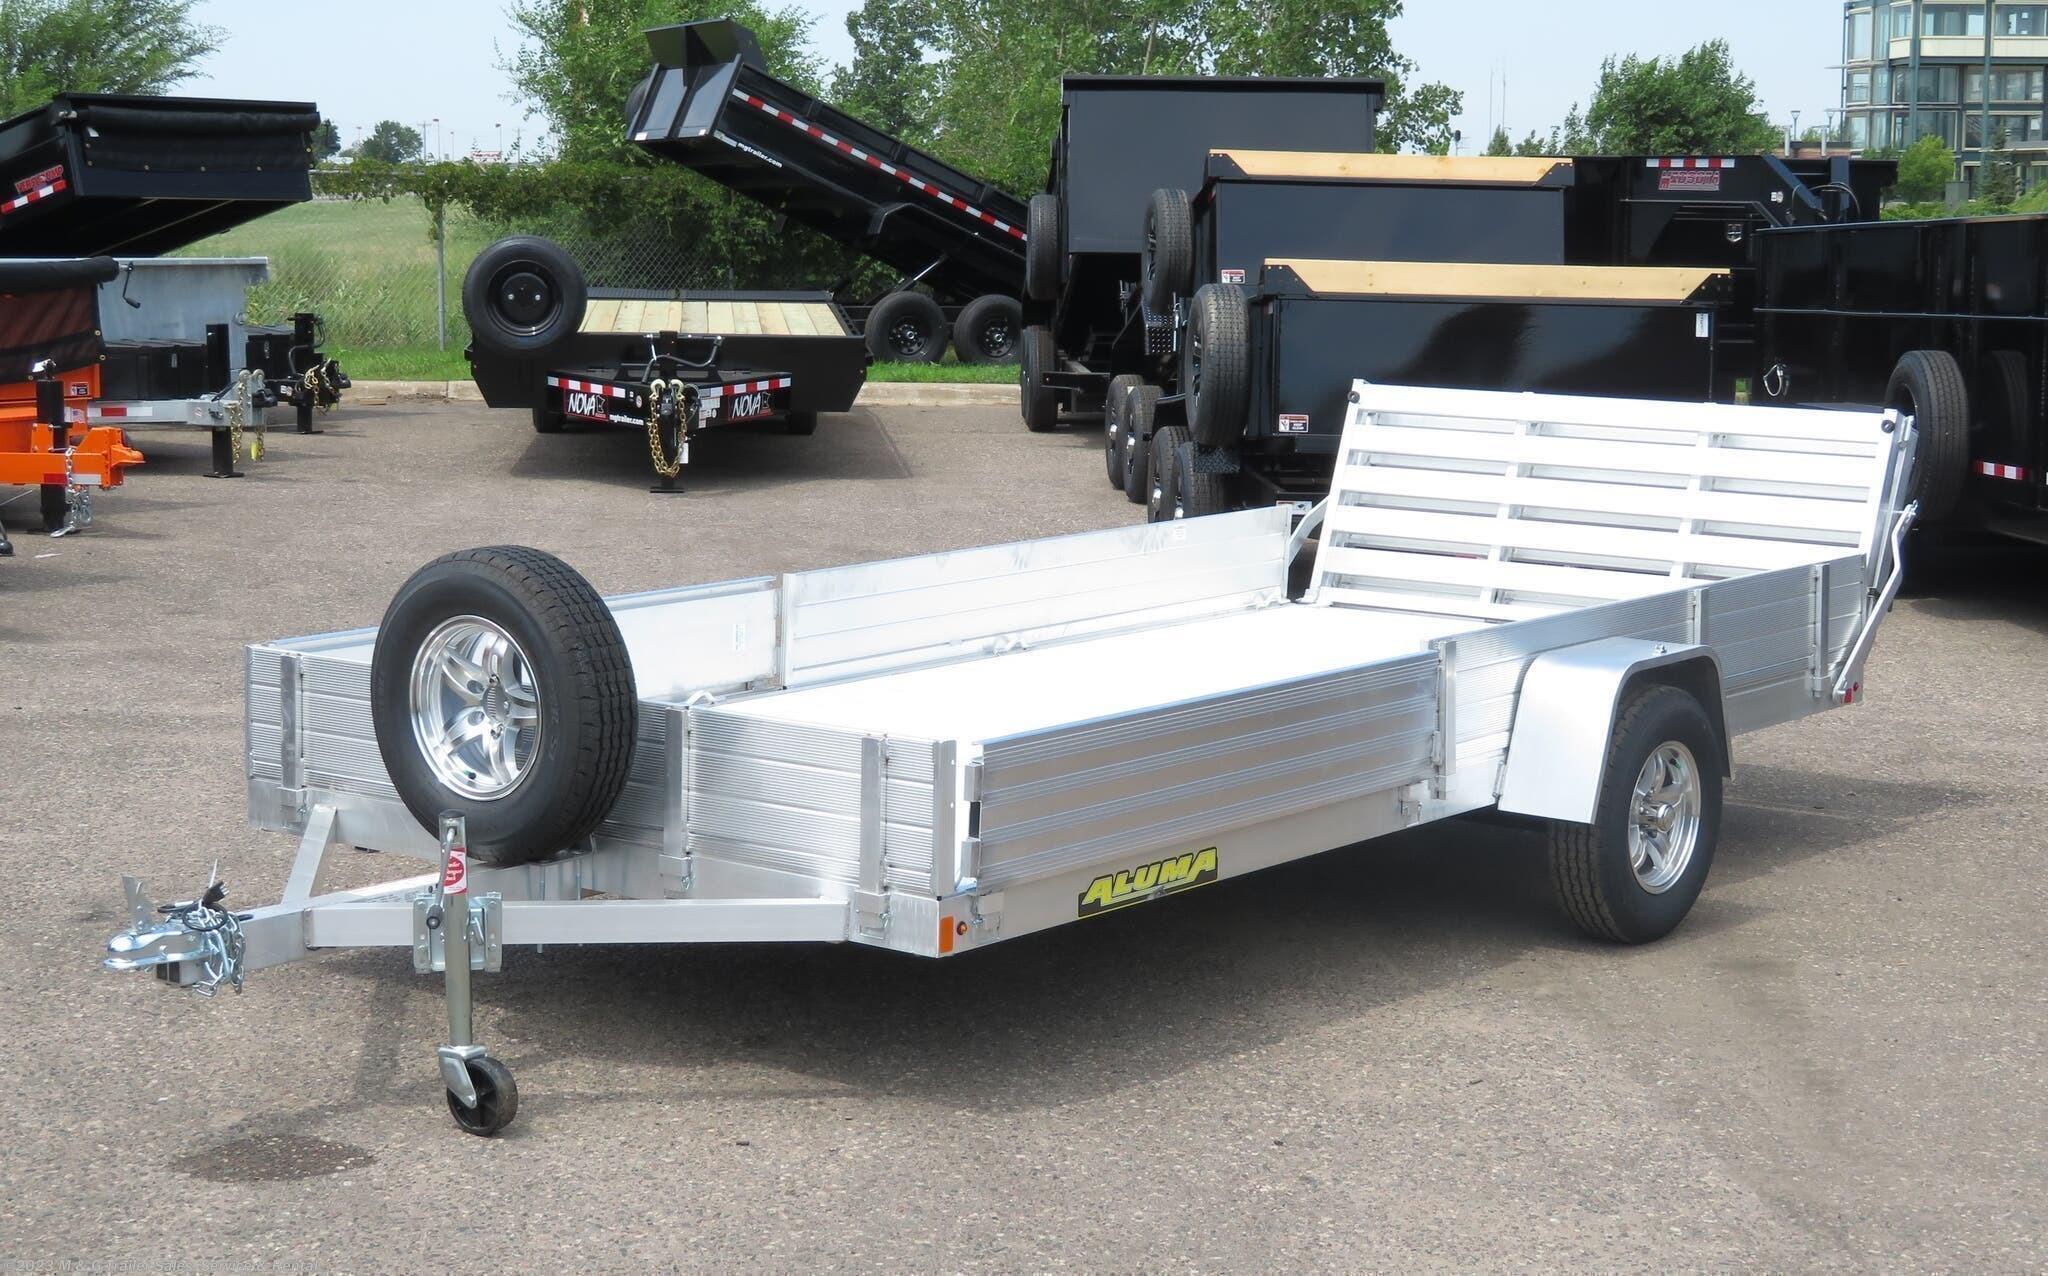 2021 Aluma 8114 SR Aluminum ATV/Utility Trailer - Stock #227080